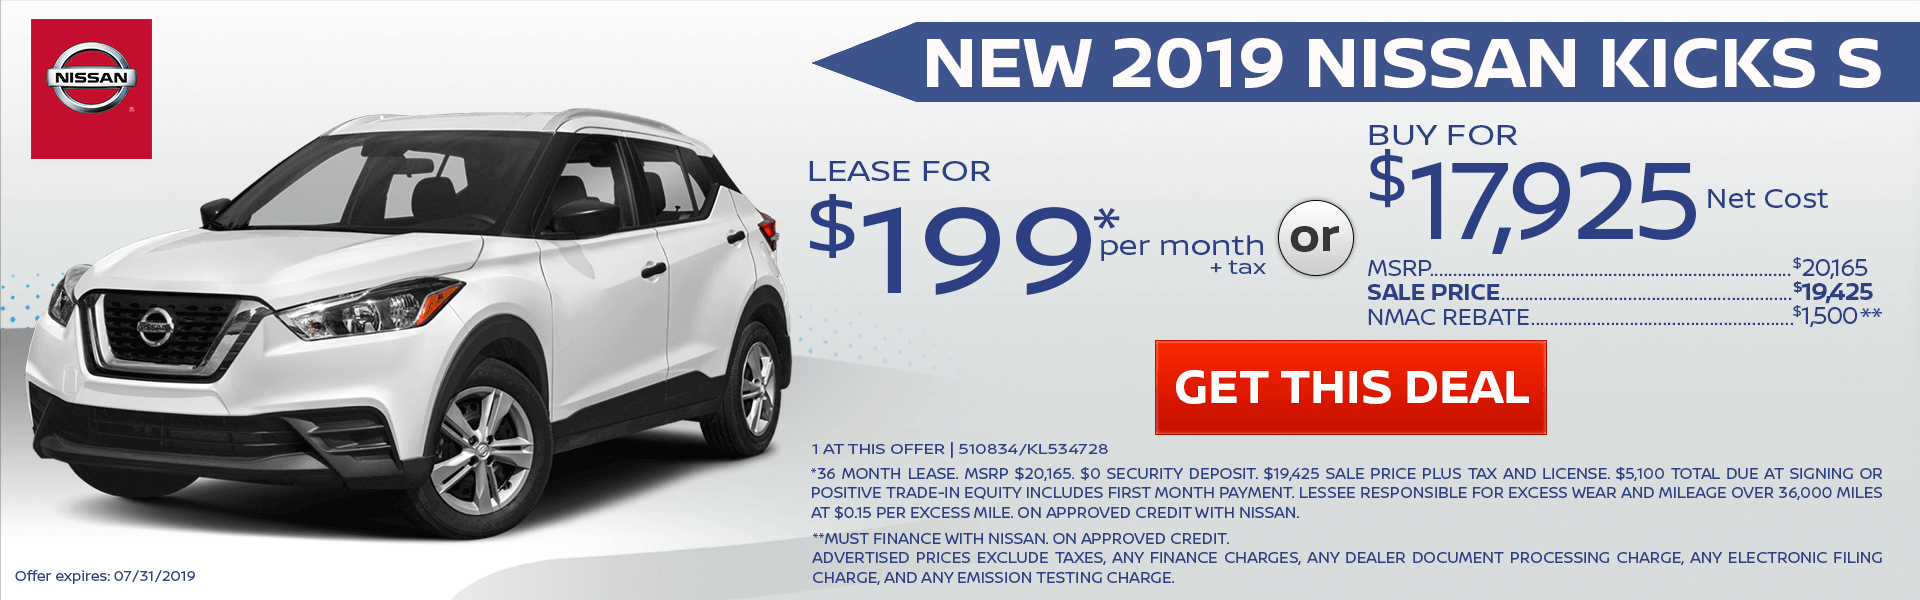 Nissan Dealership Los Angeles >> New Used Cars For Sale In Los Angeles Ross Nissan Dealership